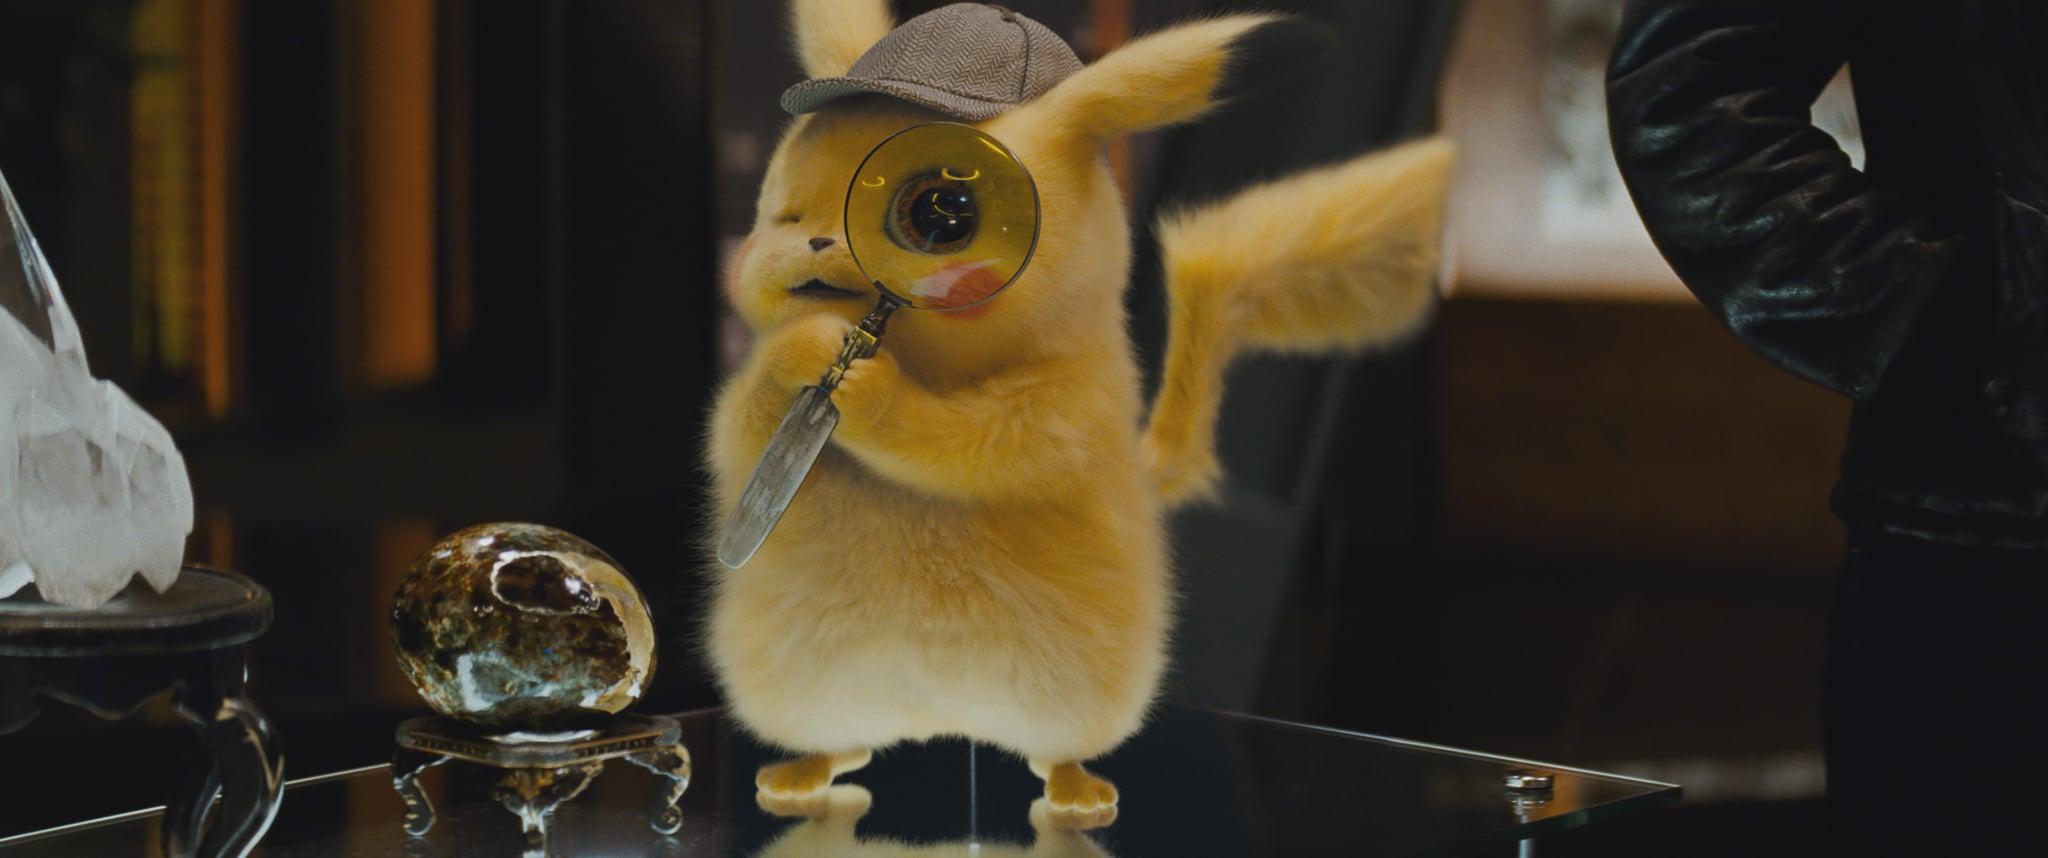 the best attitude 30535 1bc01 Ryan Reynolds Tweets Detective Pikachu Movie Leak Video